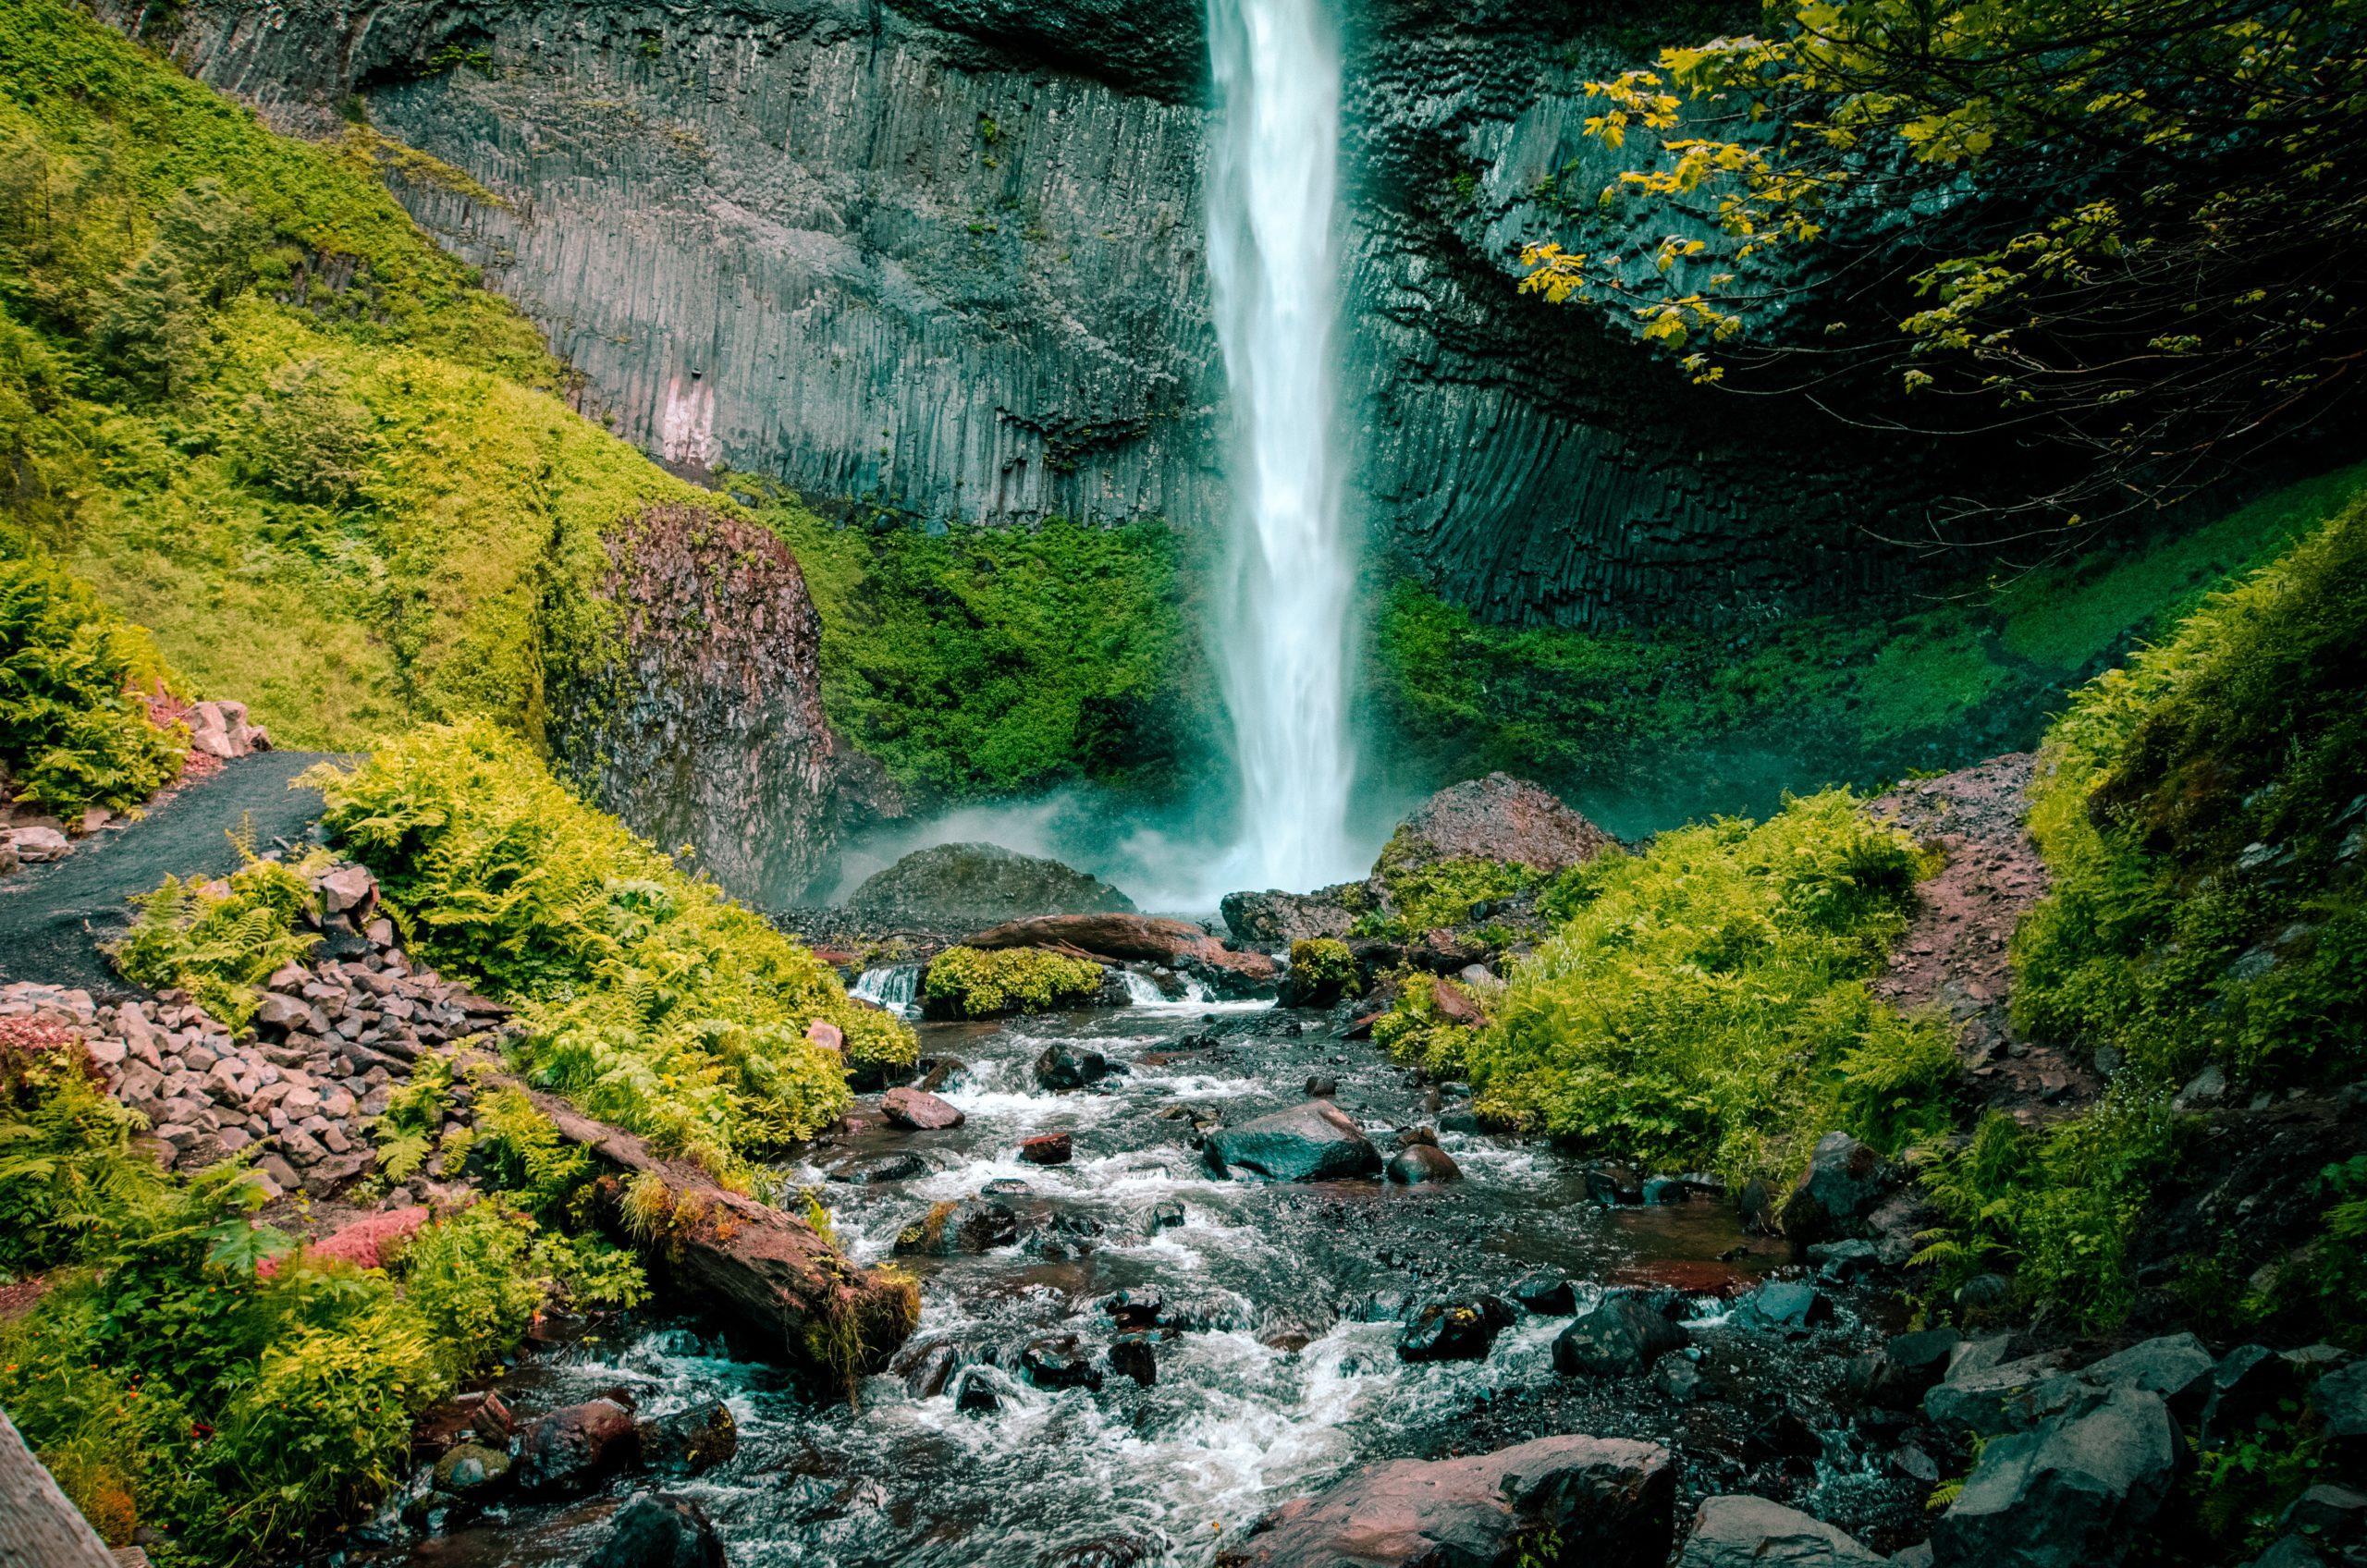 cascade-creek-environment-falls-612999